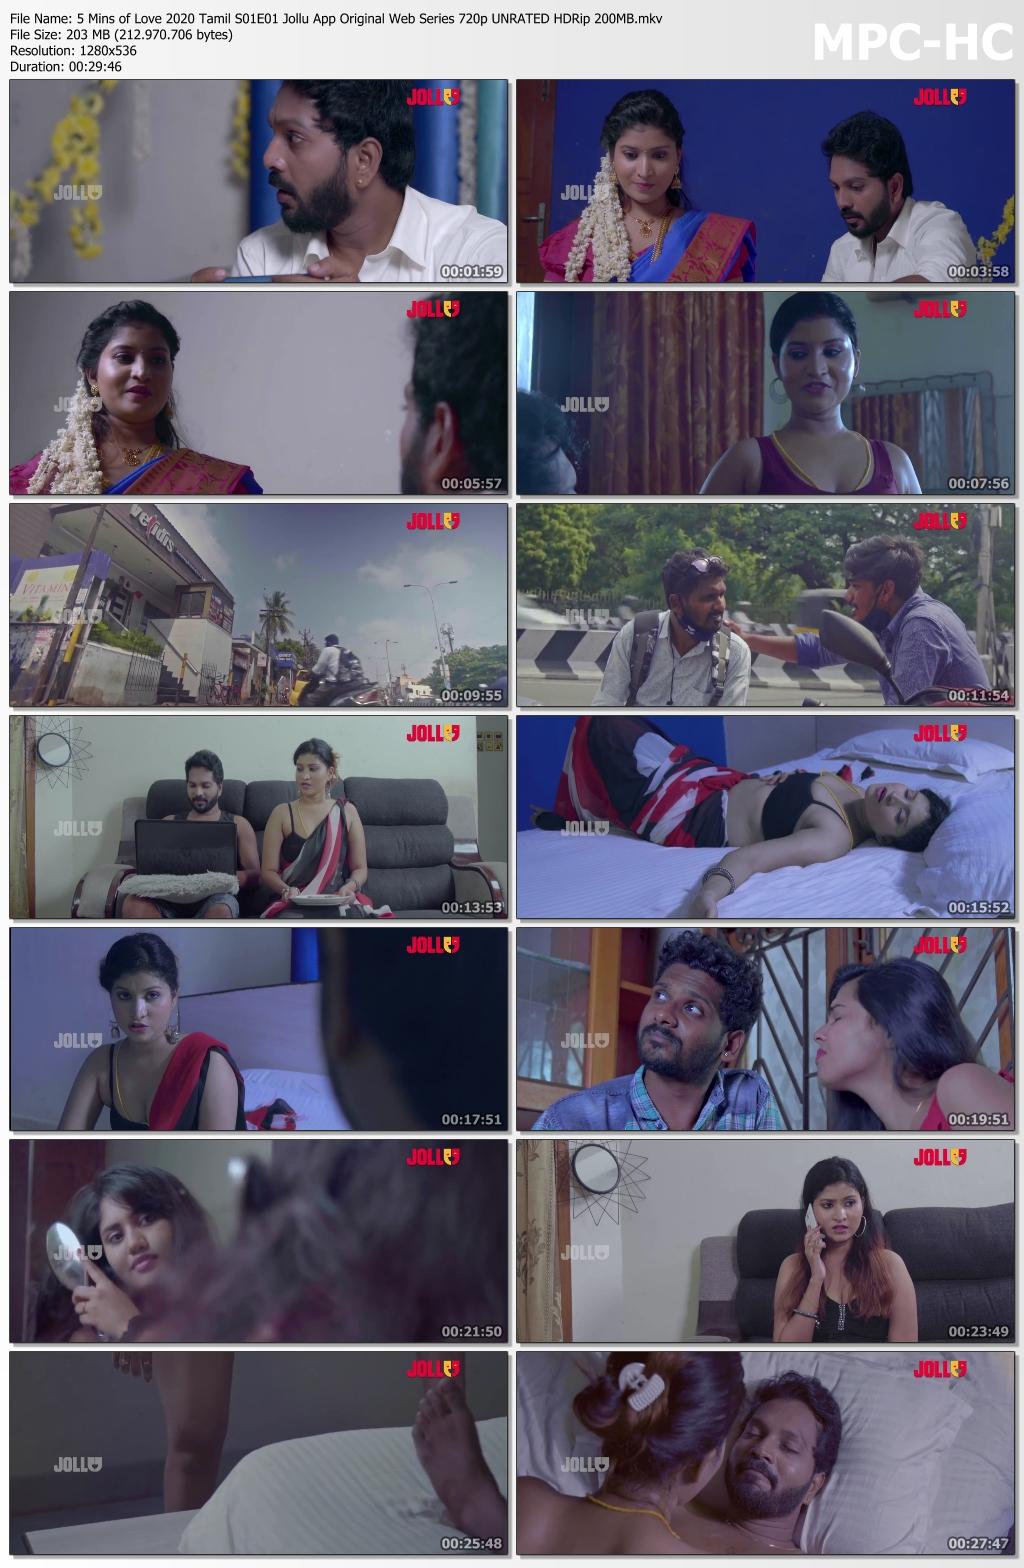 5-Mins-of-Love-2020-Tamil-S01-E01-Jollu-App-Original-Web-Series-720p-UNRATED-HDRip-200-MB-mkv-thumbs